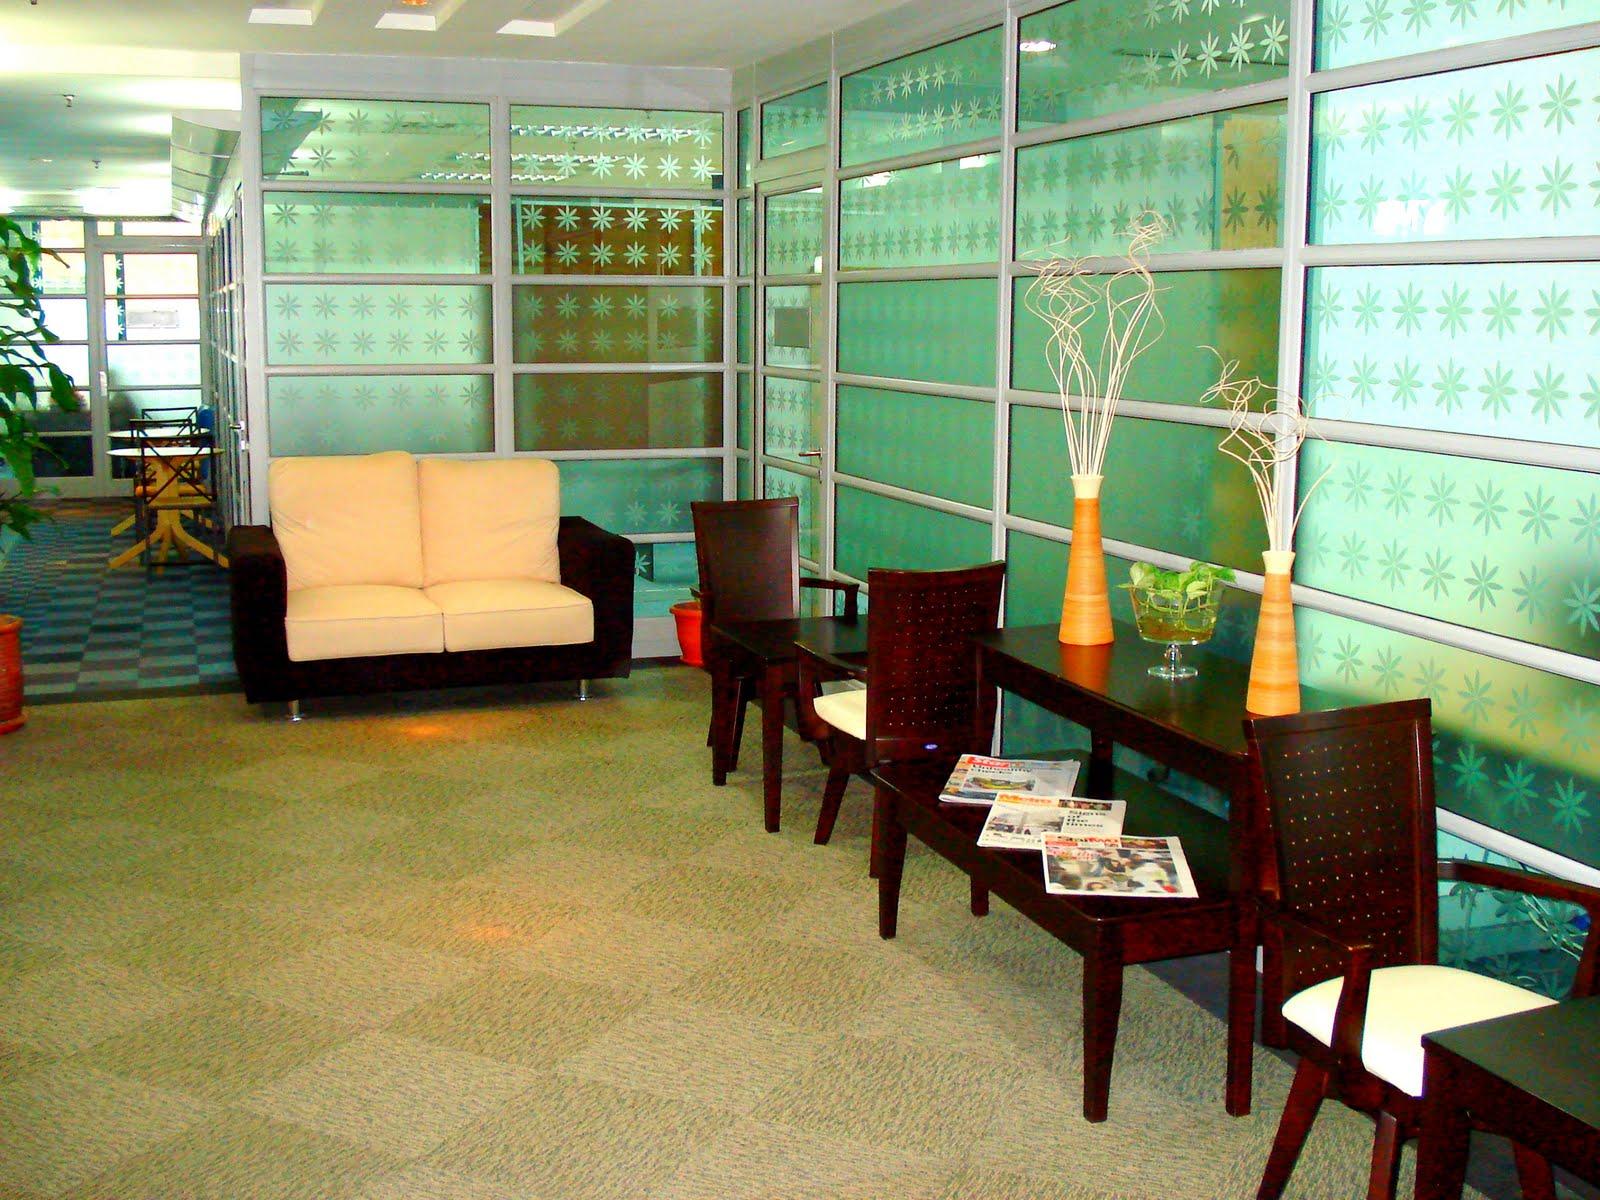 Seminar Room For Rent In Kl